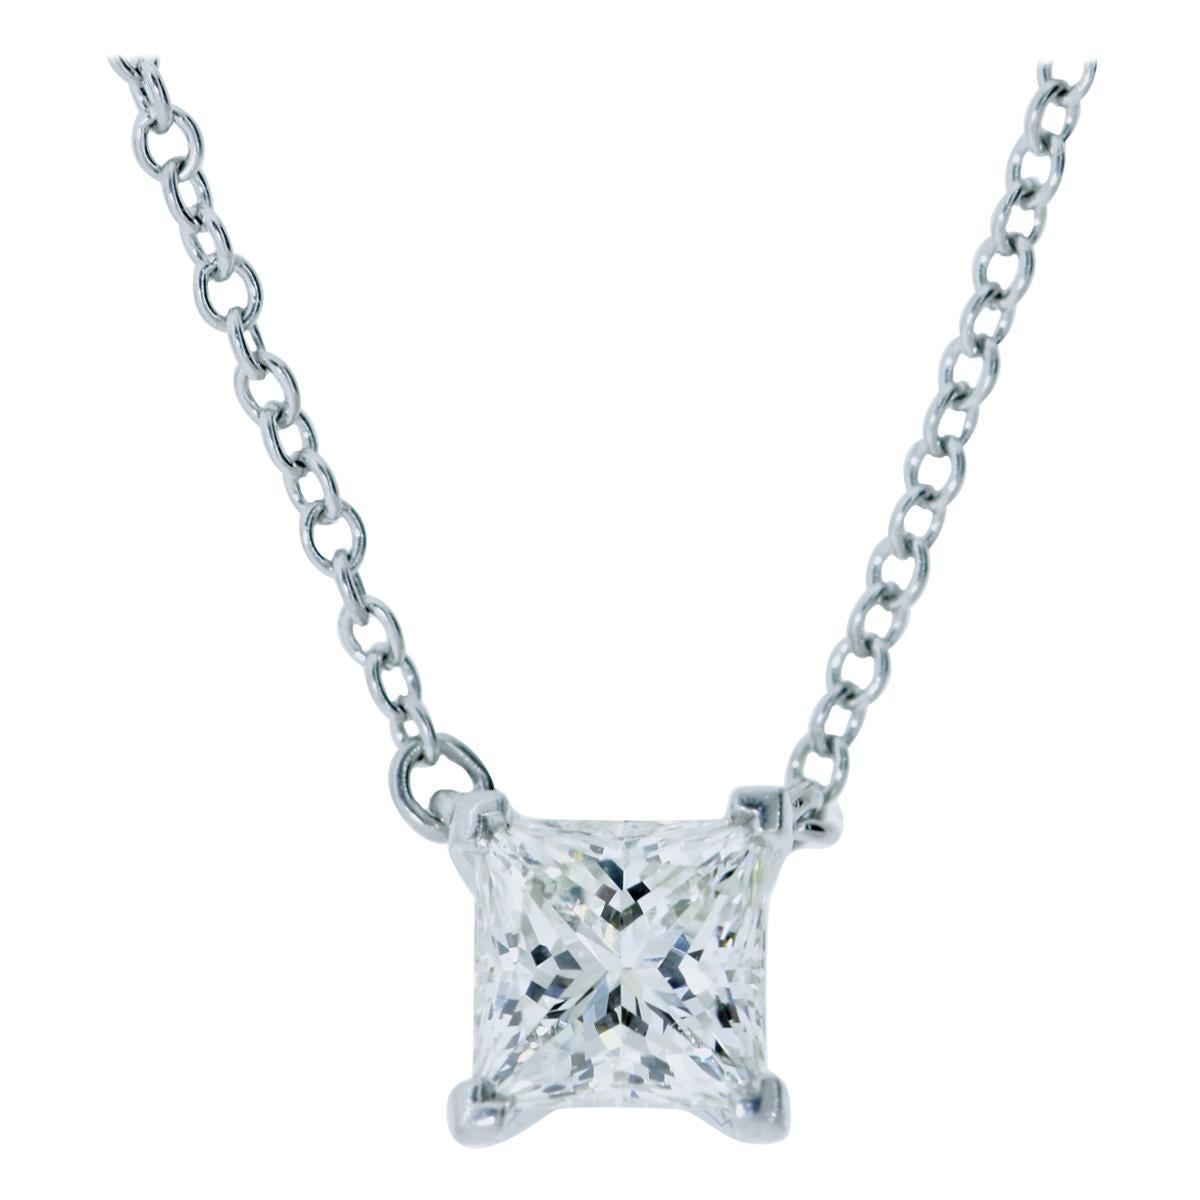 Diamond Pendant Necklace by Tiffany & Co.